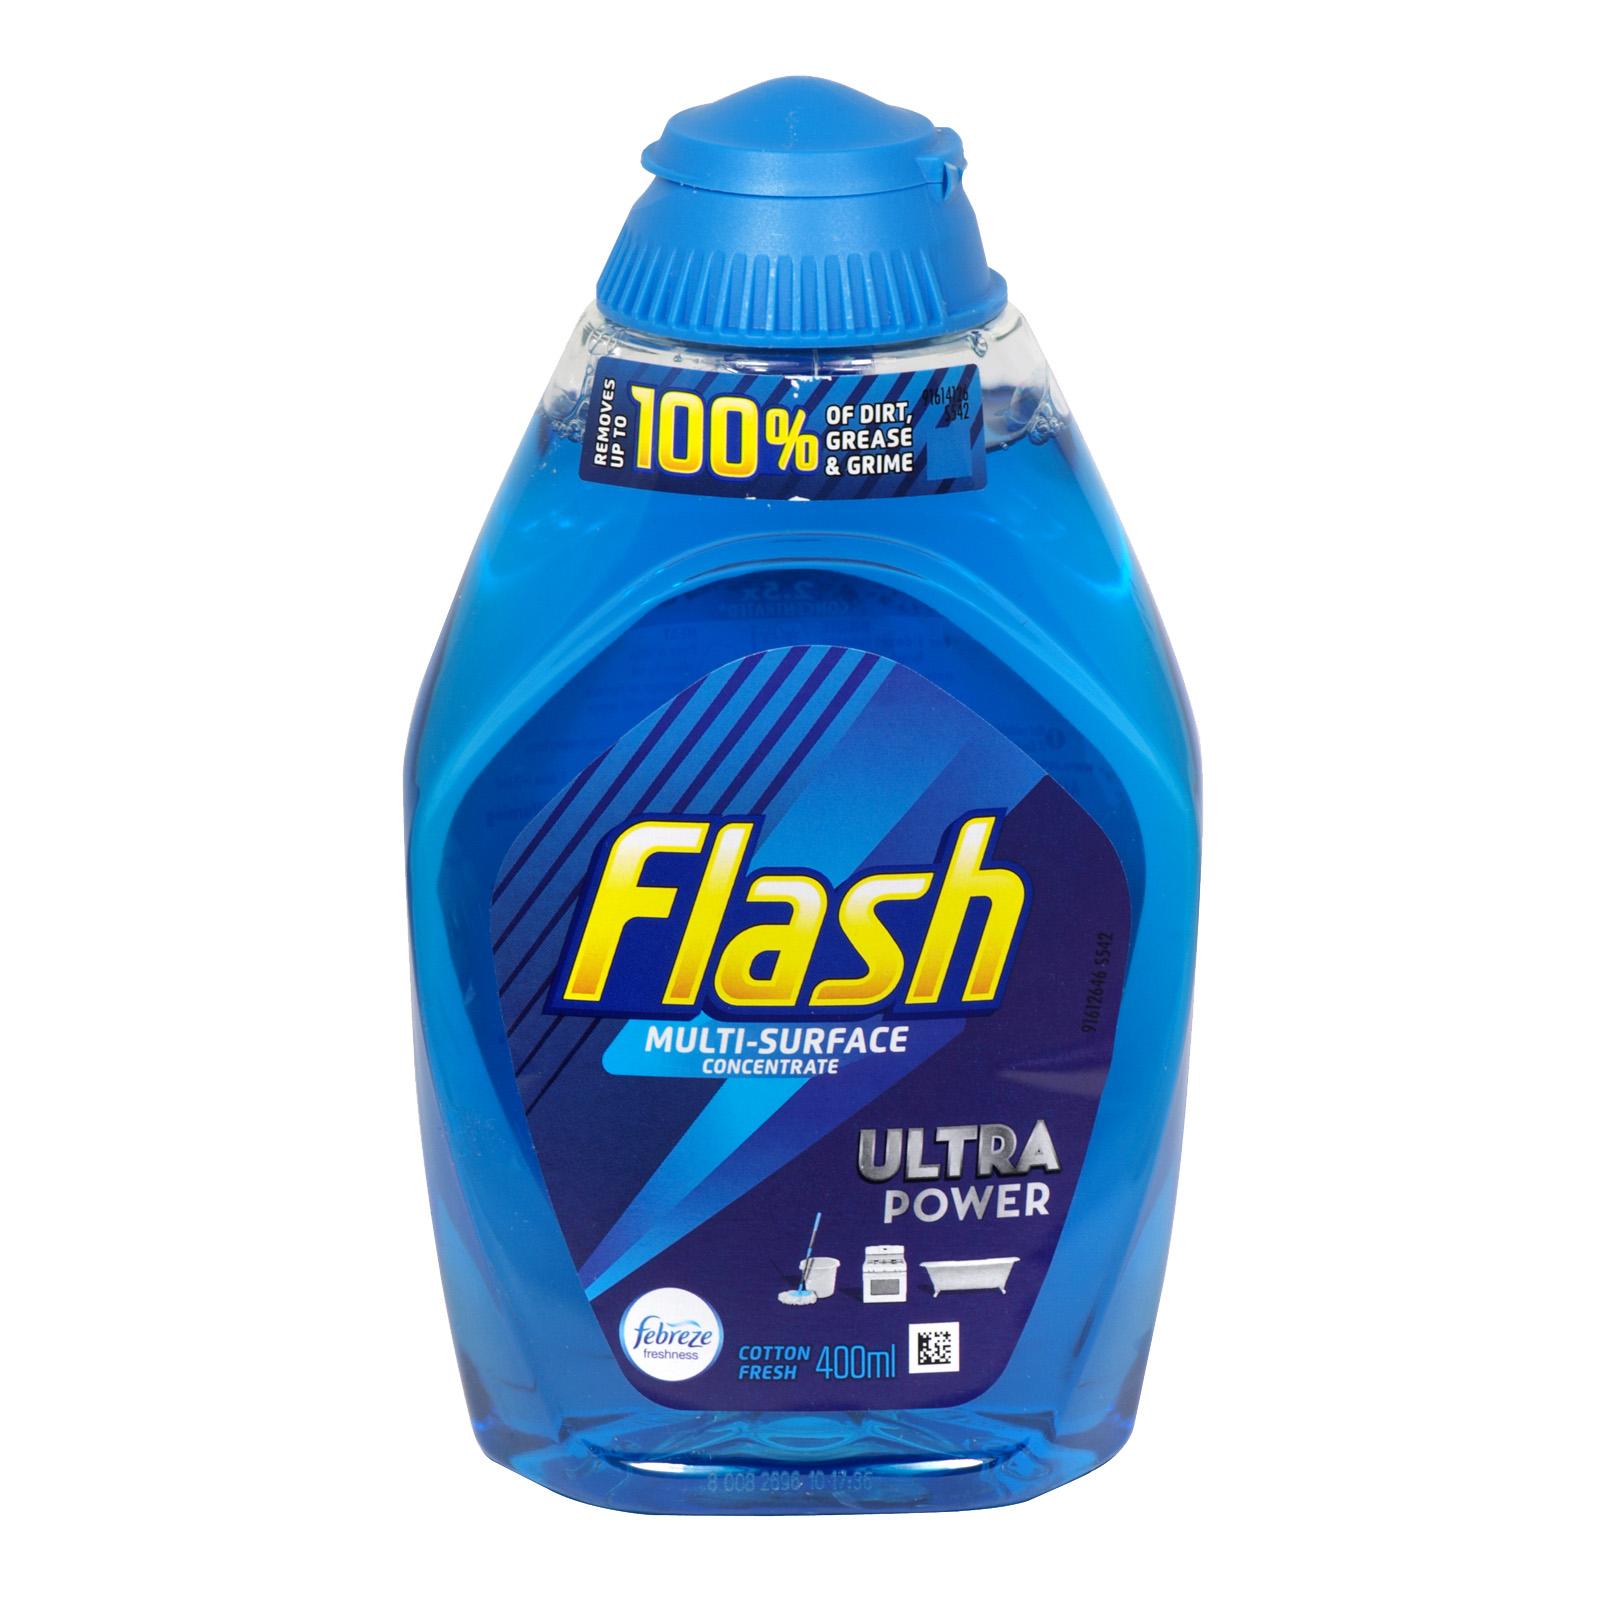 FLASH LIQUID GEL 400ML COTTON FRESH X10